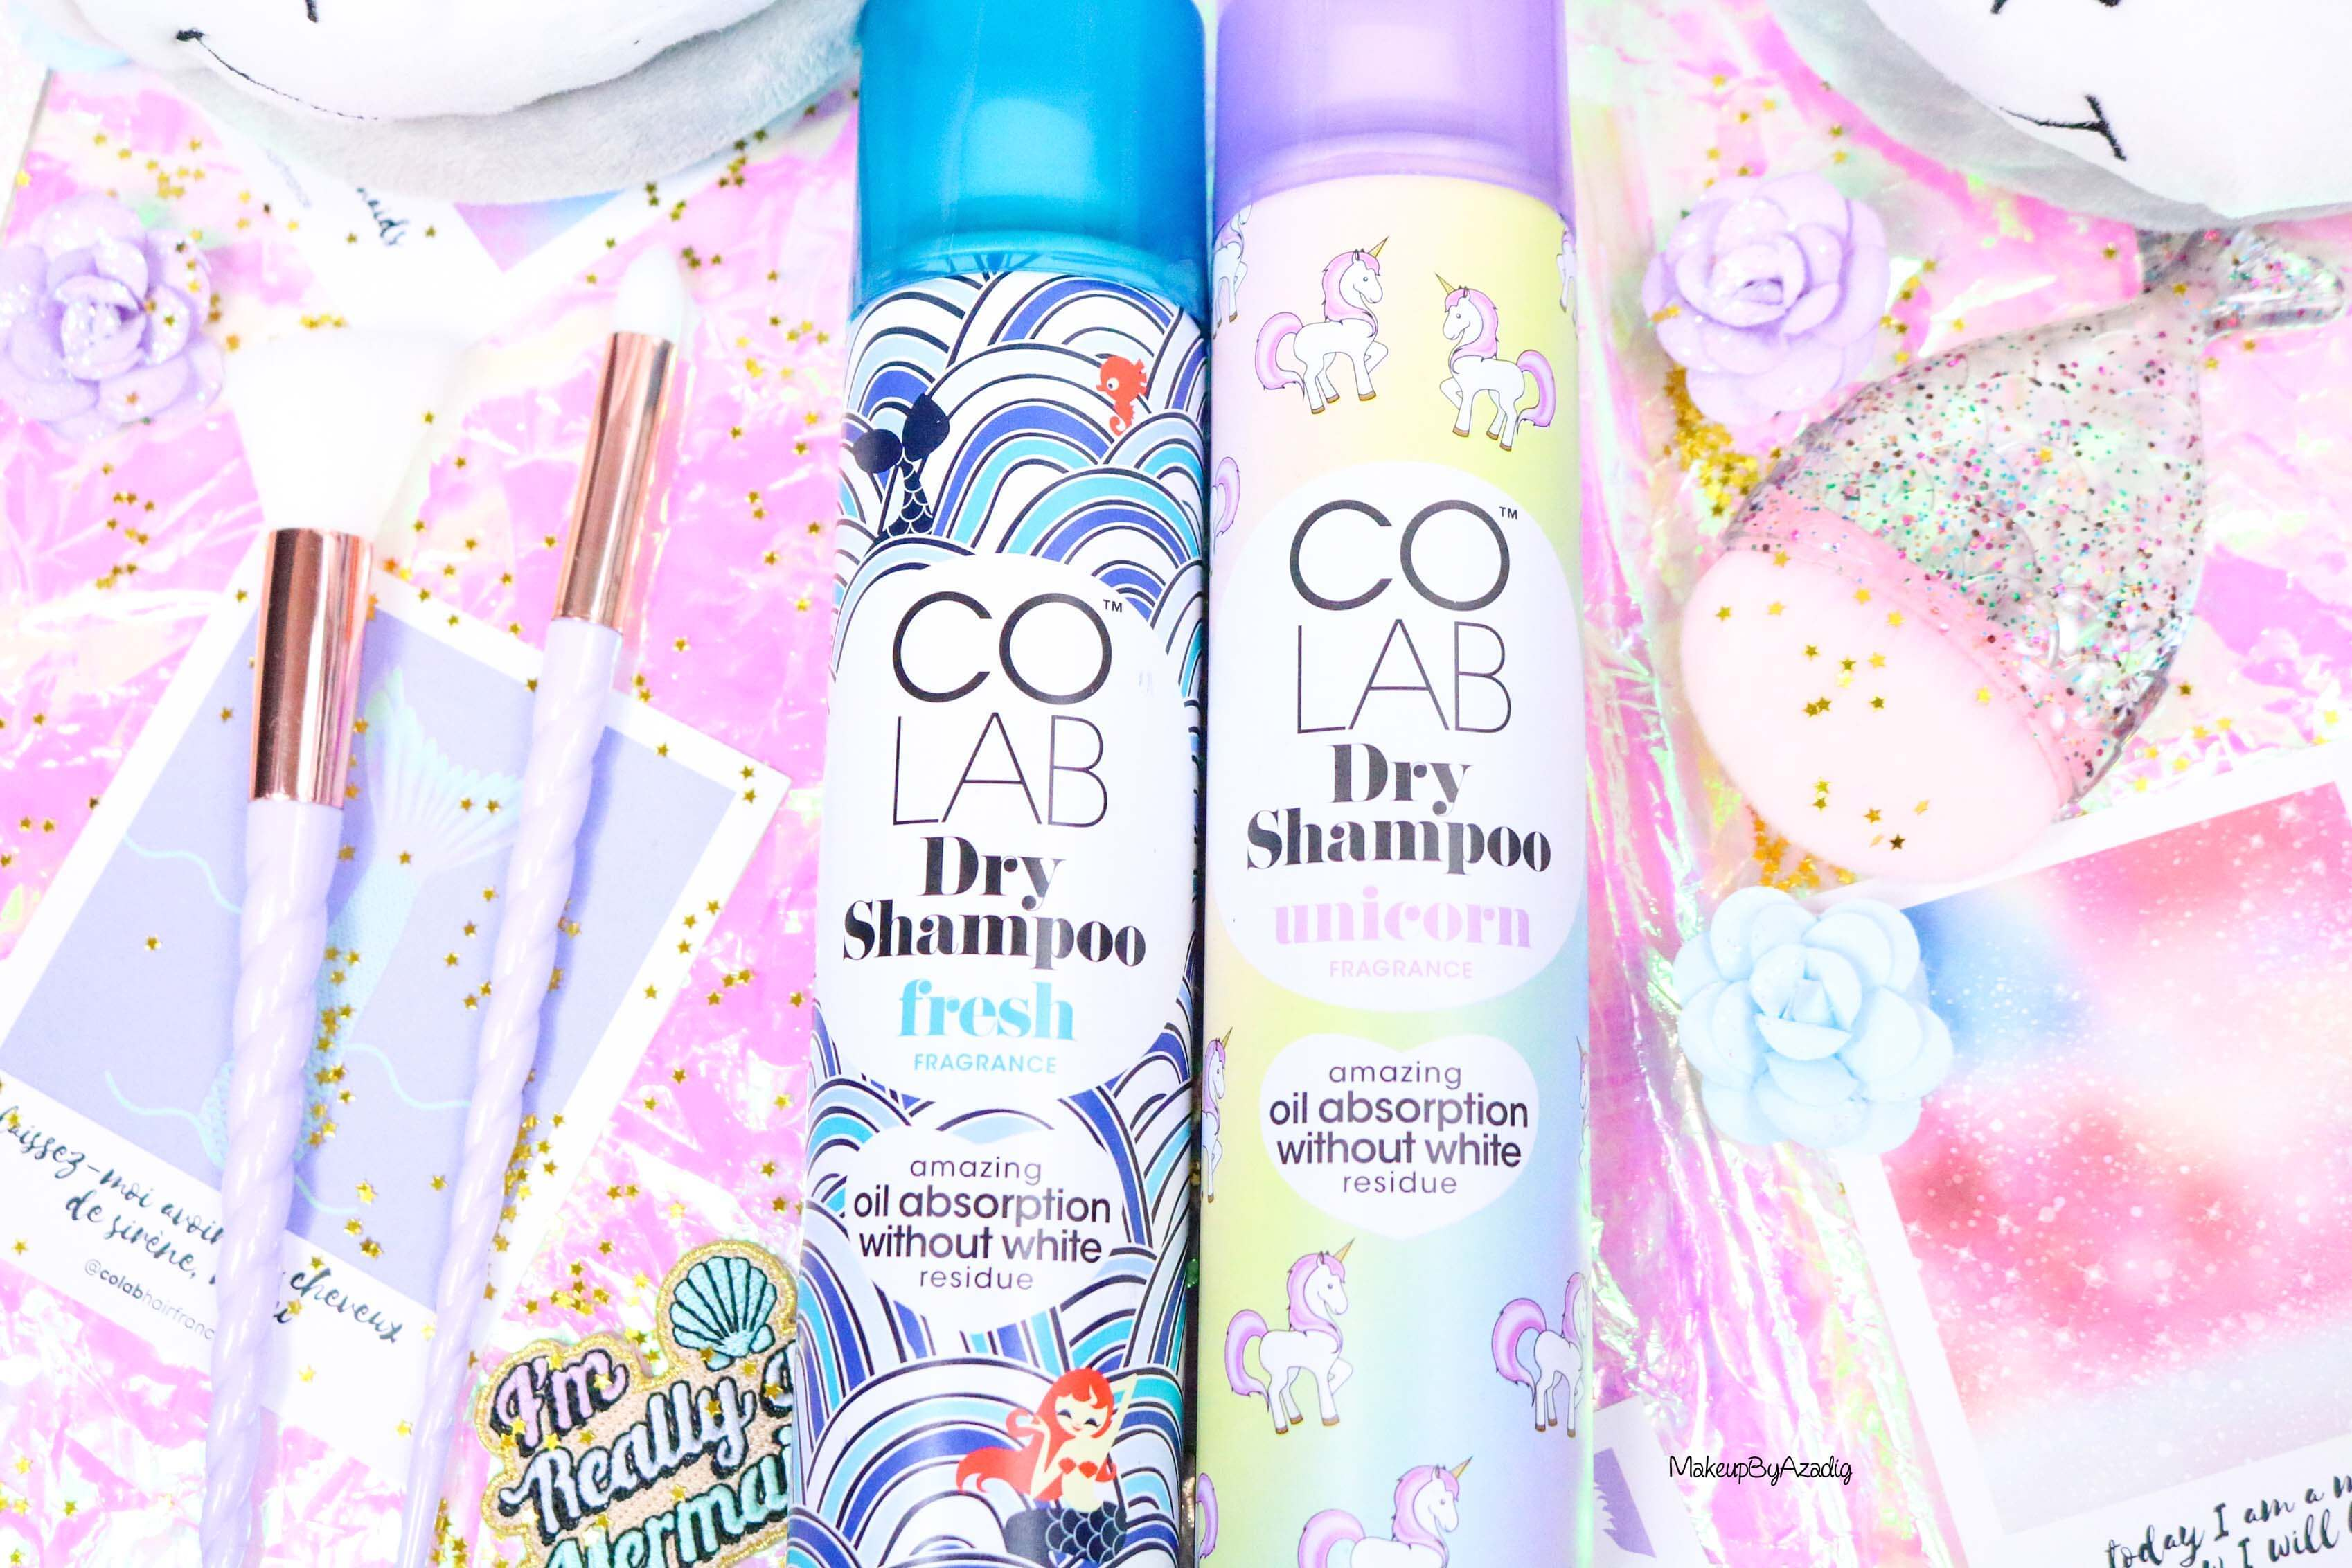 revue-shampooing-sec-colab-batiste-fresh-unicorn-monoprix-feelunique-prix-avis--soin-capillaire-efficacite-makeupbyazadig-zoom